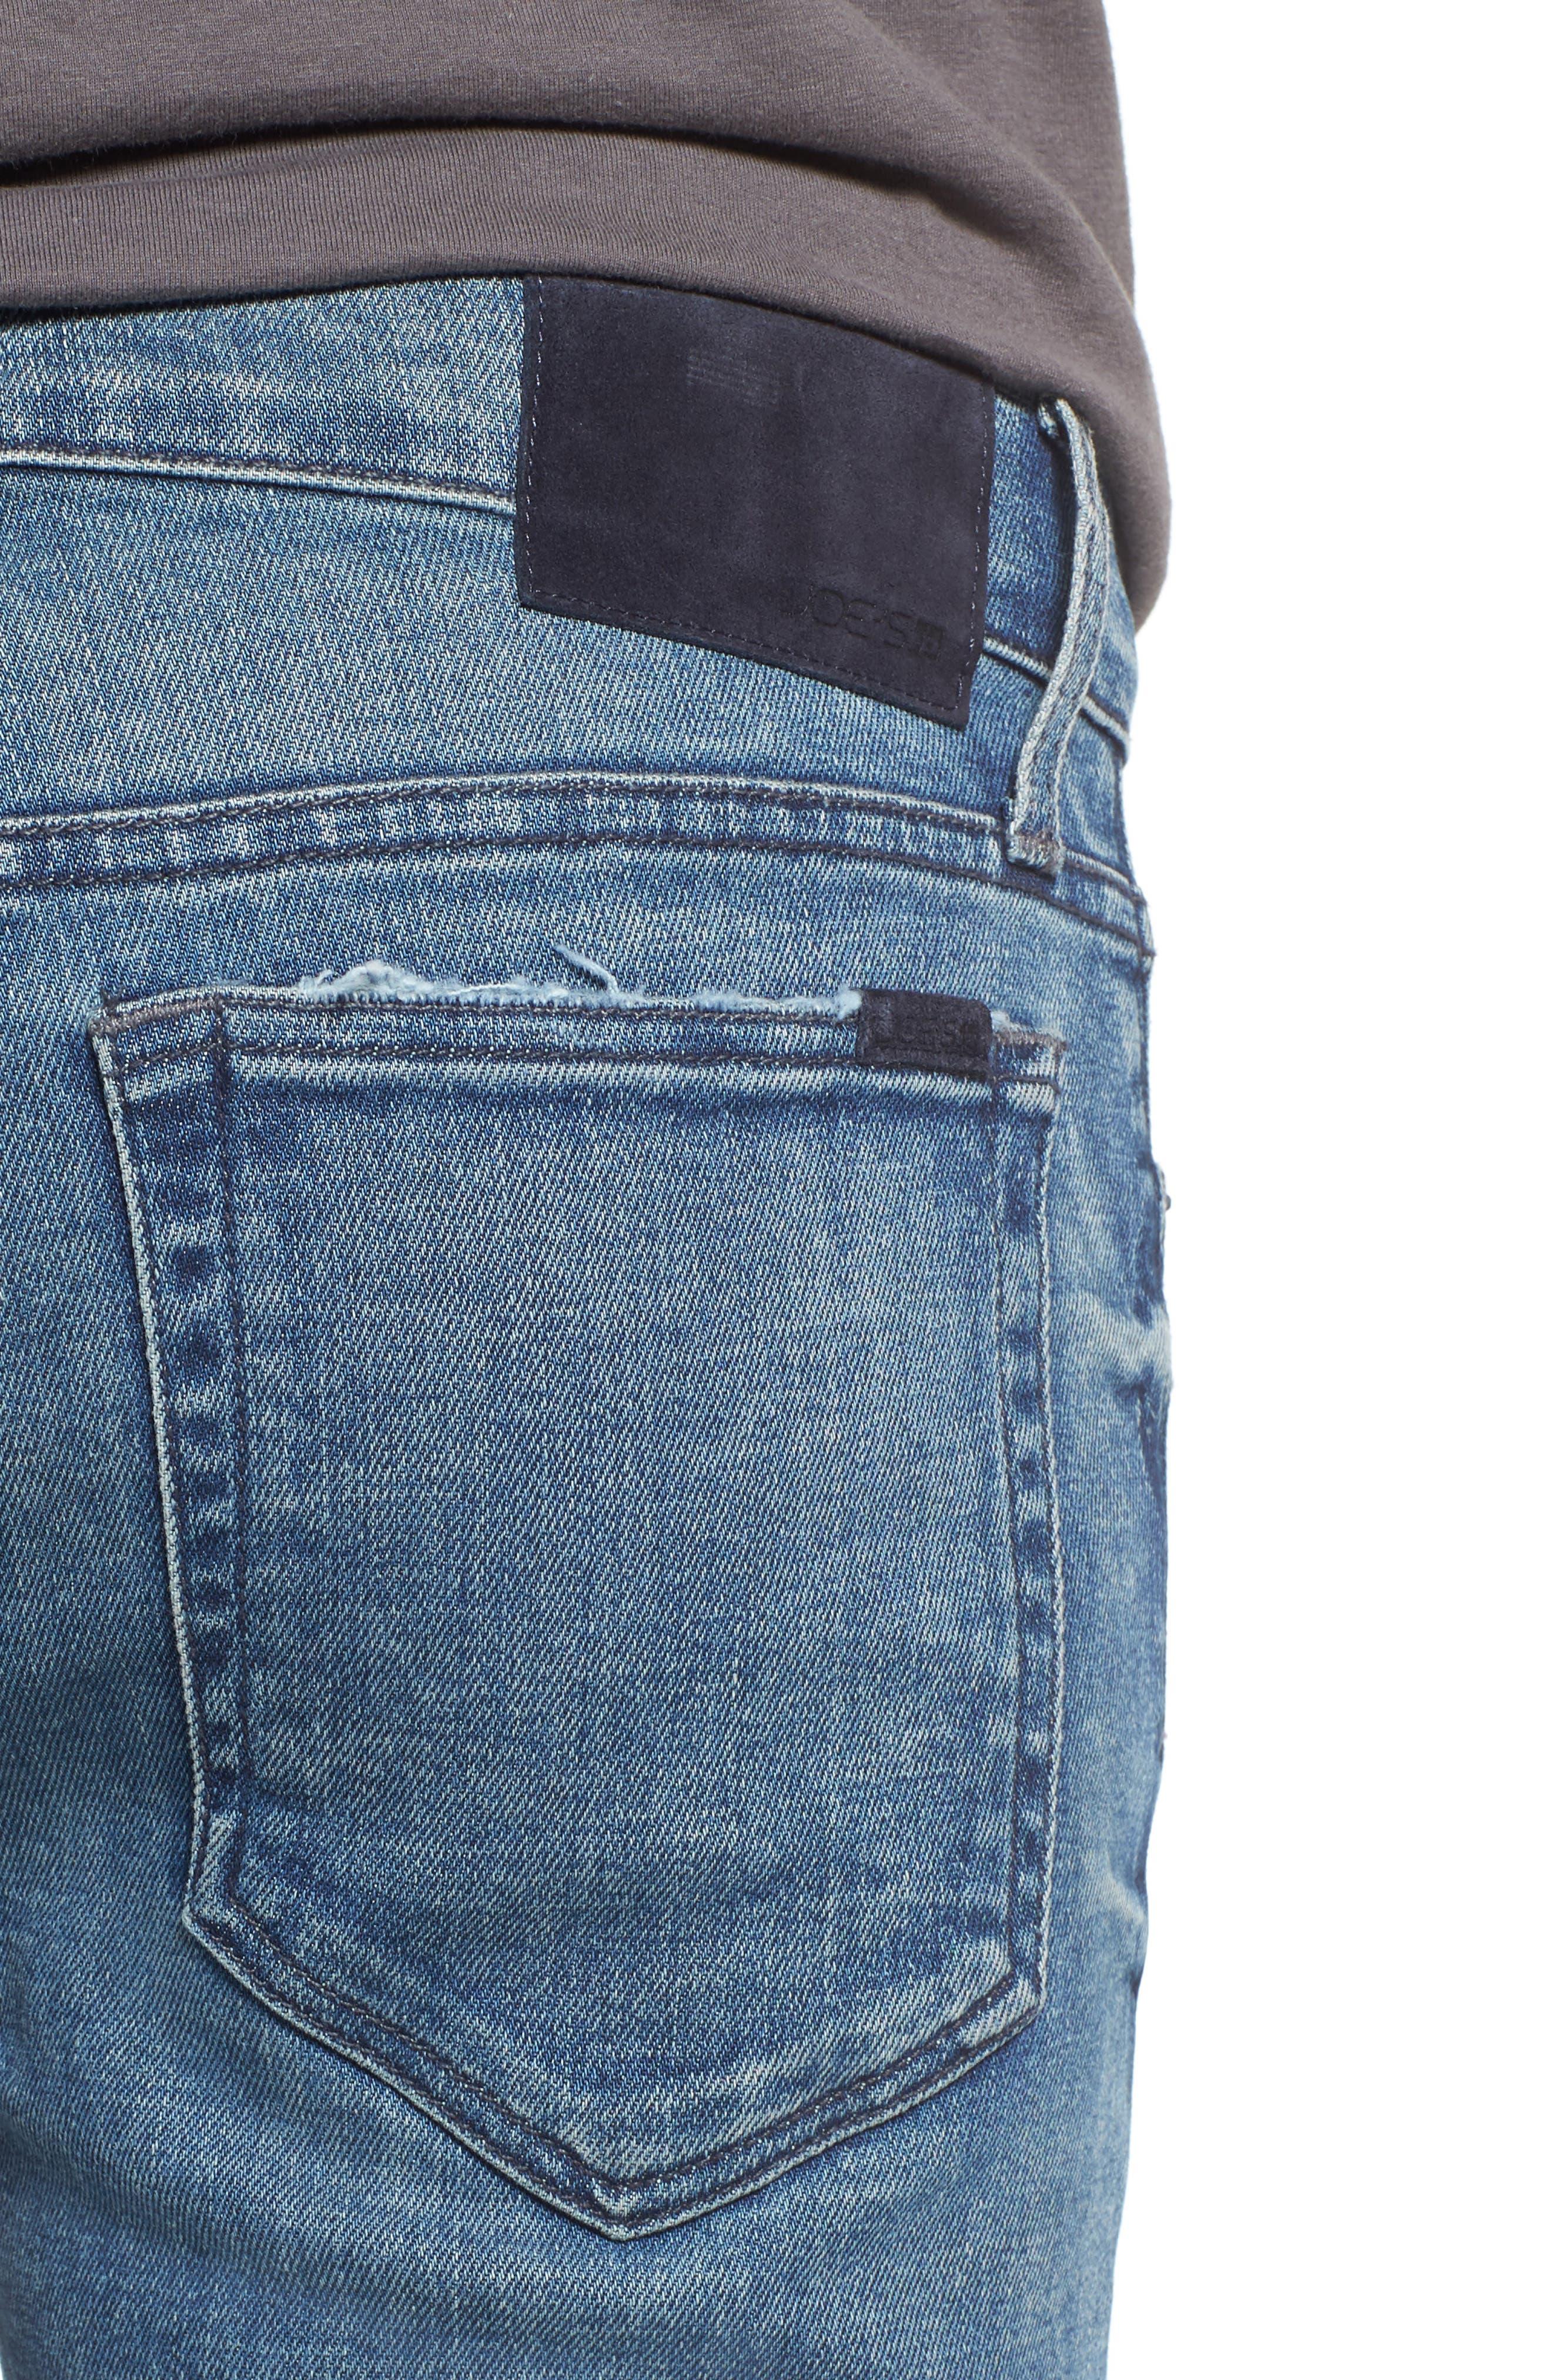 Slim Skinny Fit Jeans,                             Alternate thumbnail 4, color,